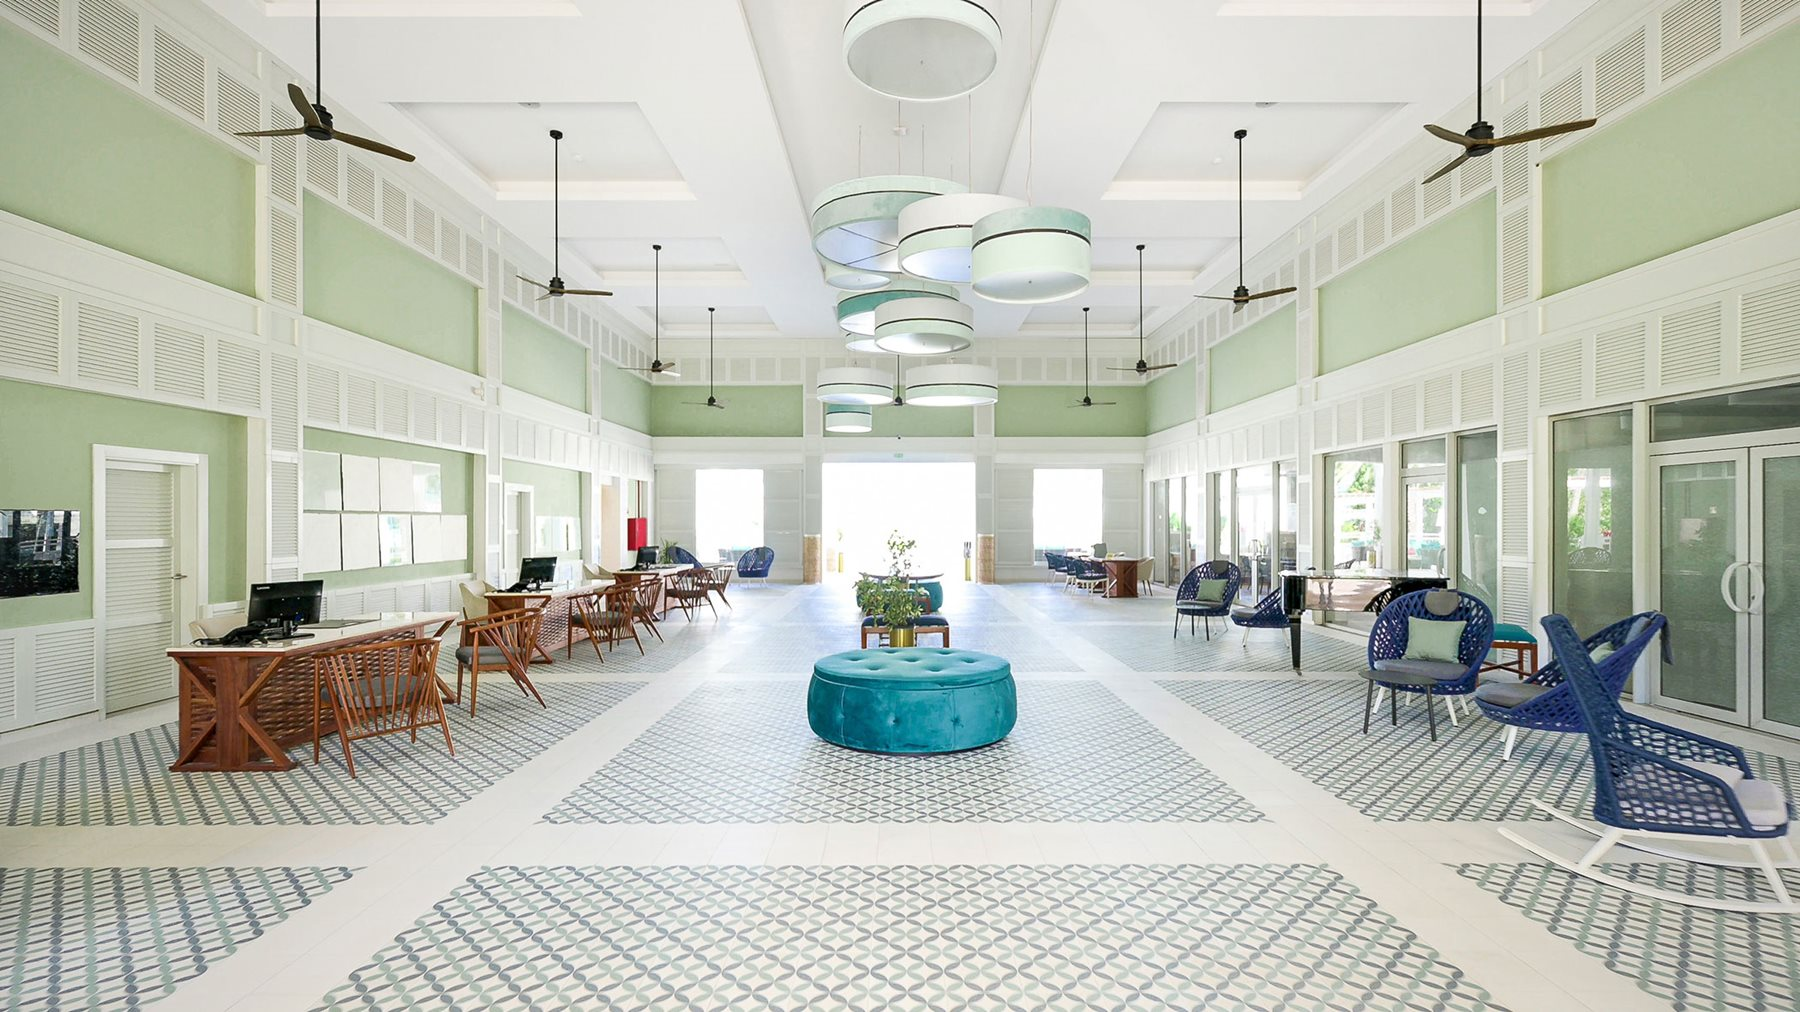 SXM-Secrets-St-Martin-Resort-Spa-Lobby-002